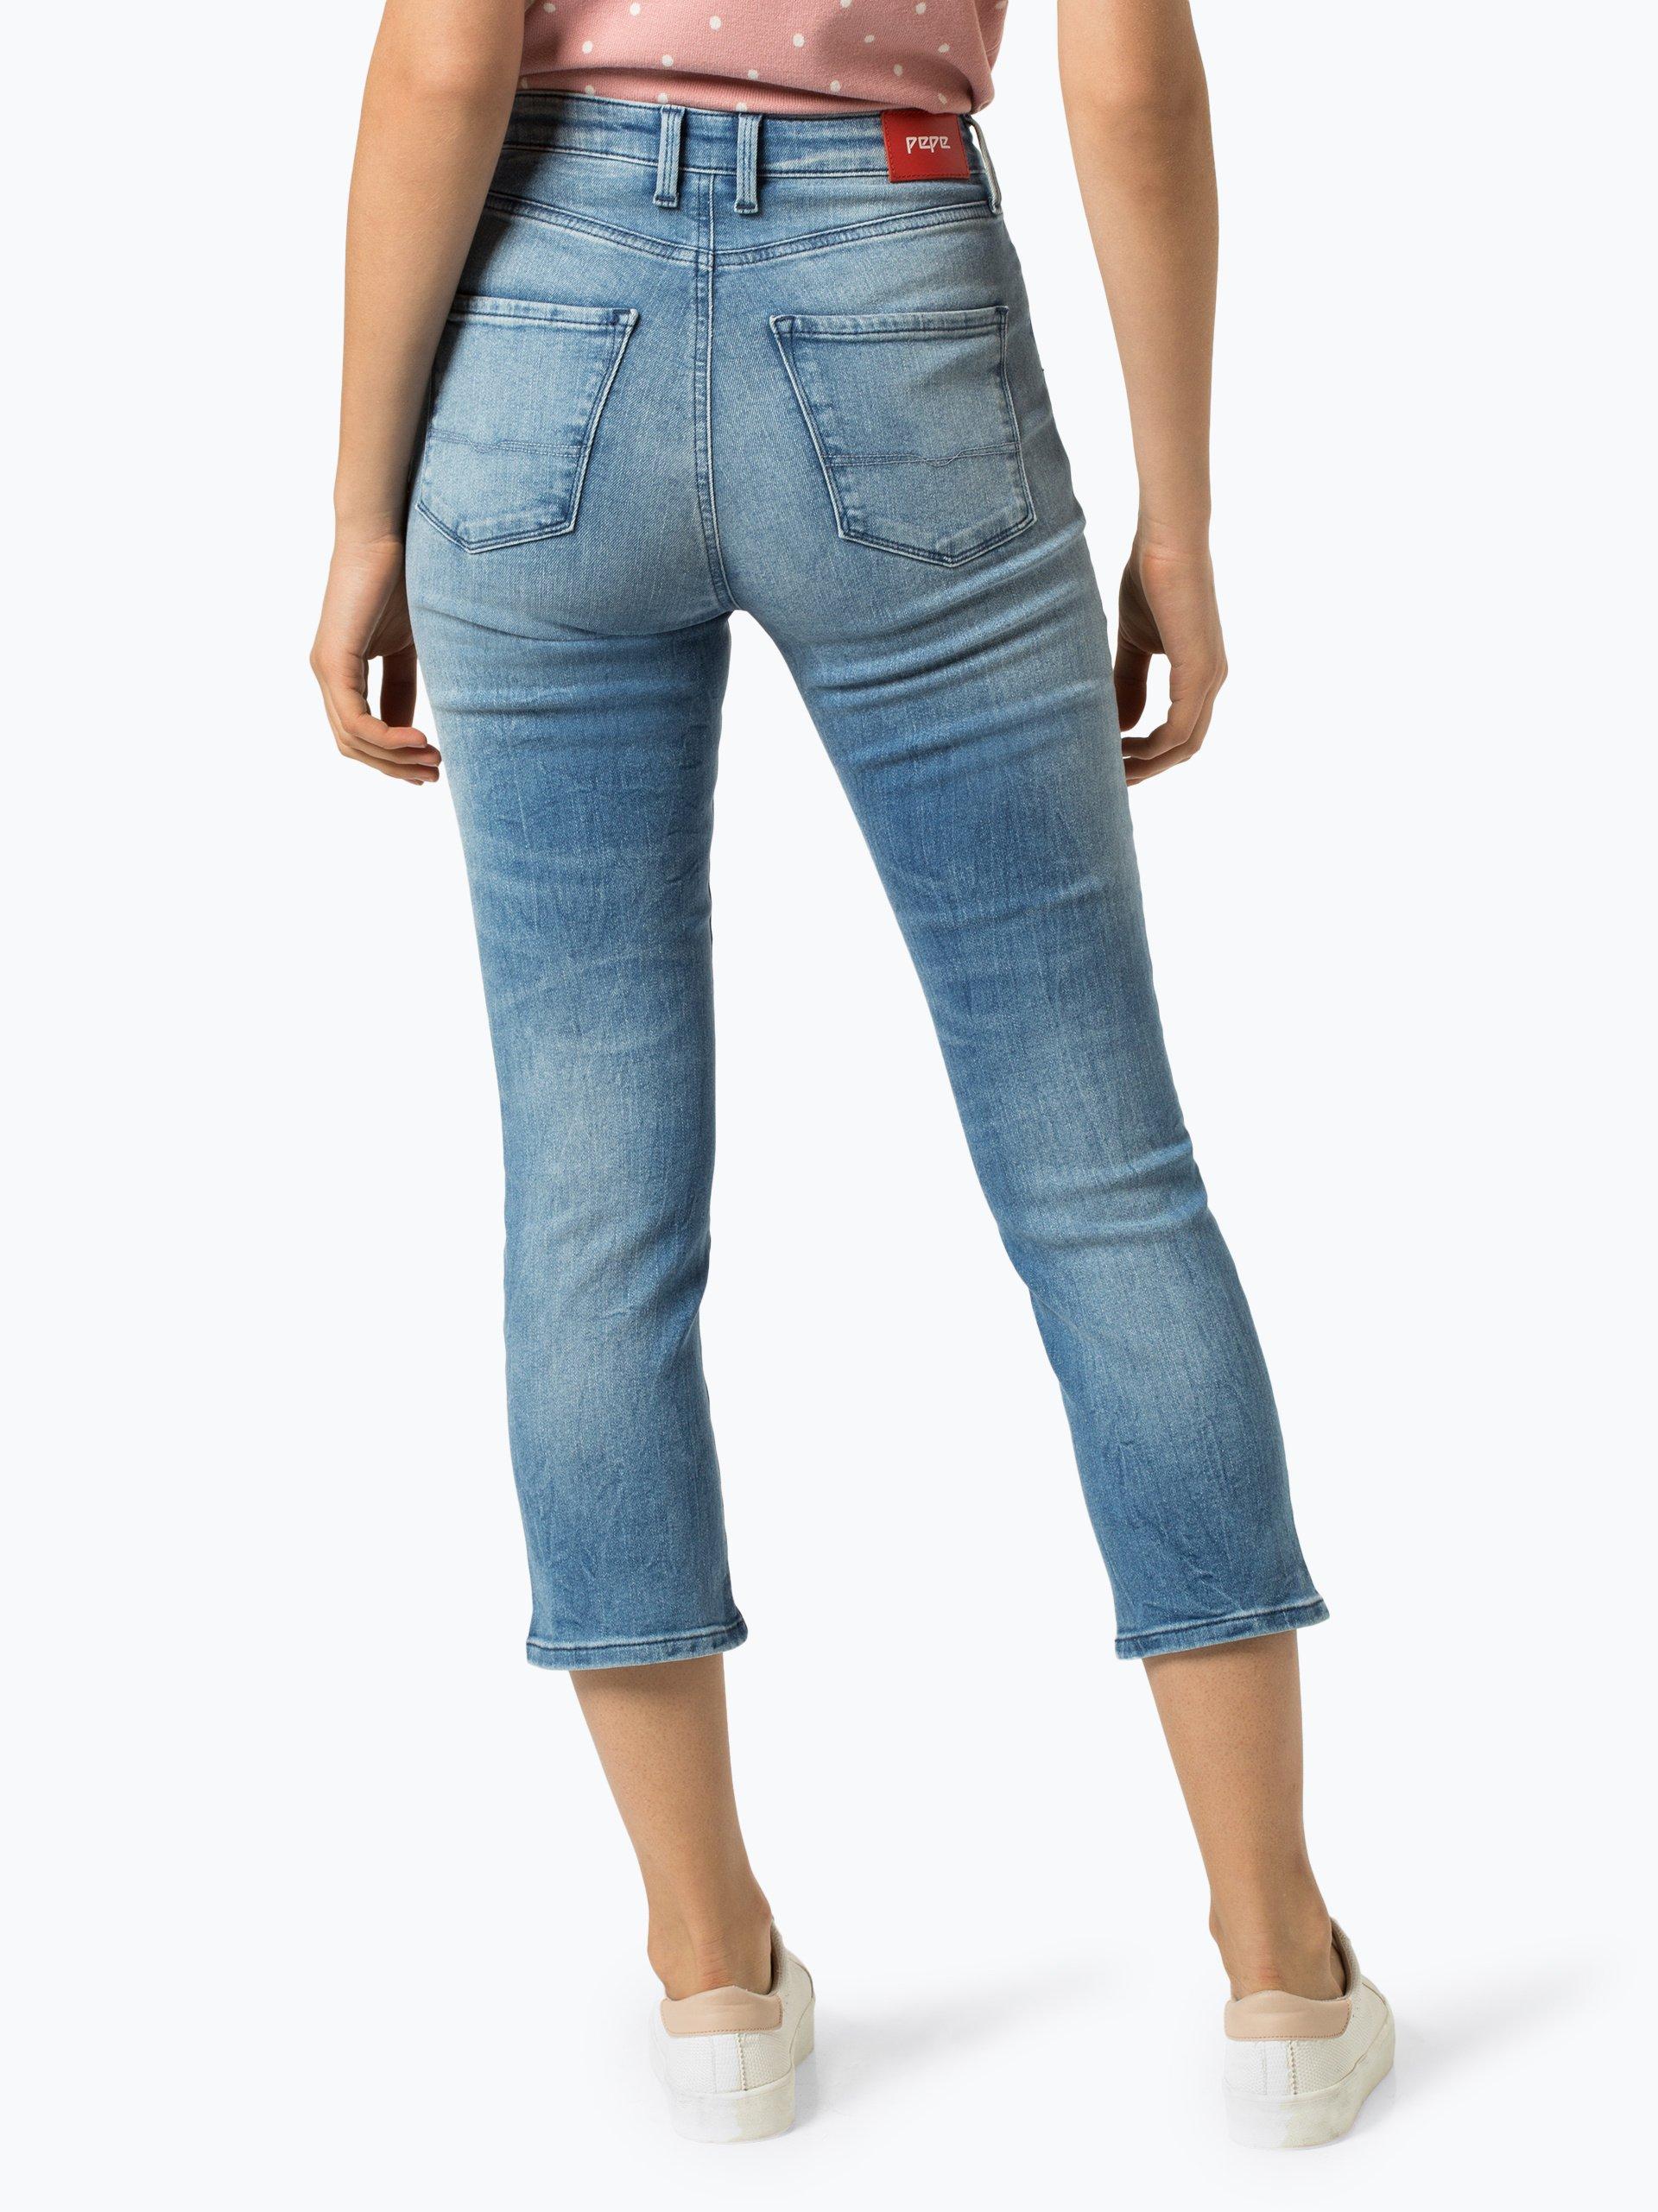 Pepe Jeans Damen Jeans - Dion 7/8